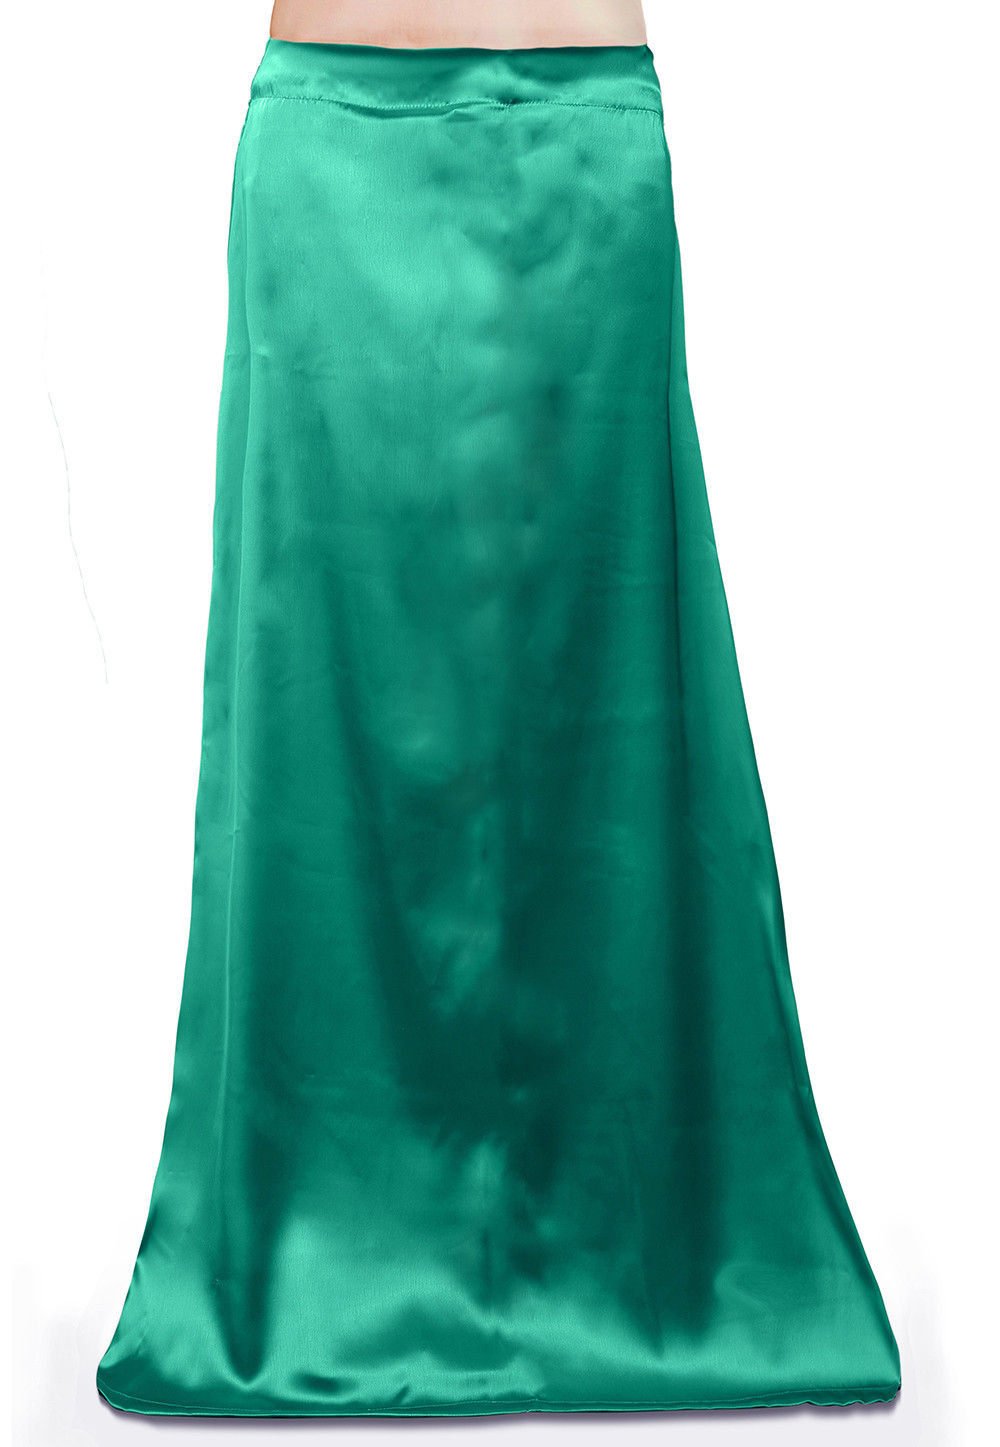 Satin Petticoat in Green